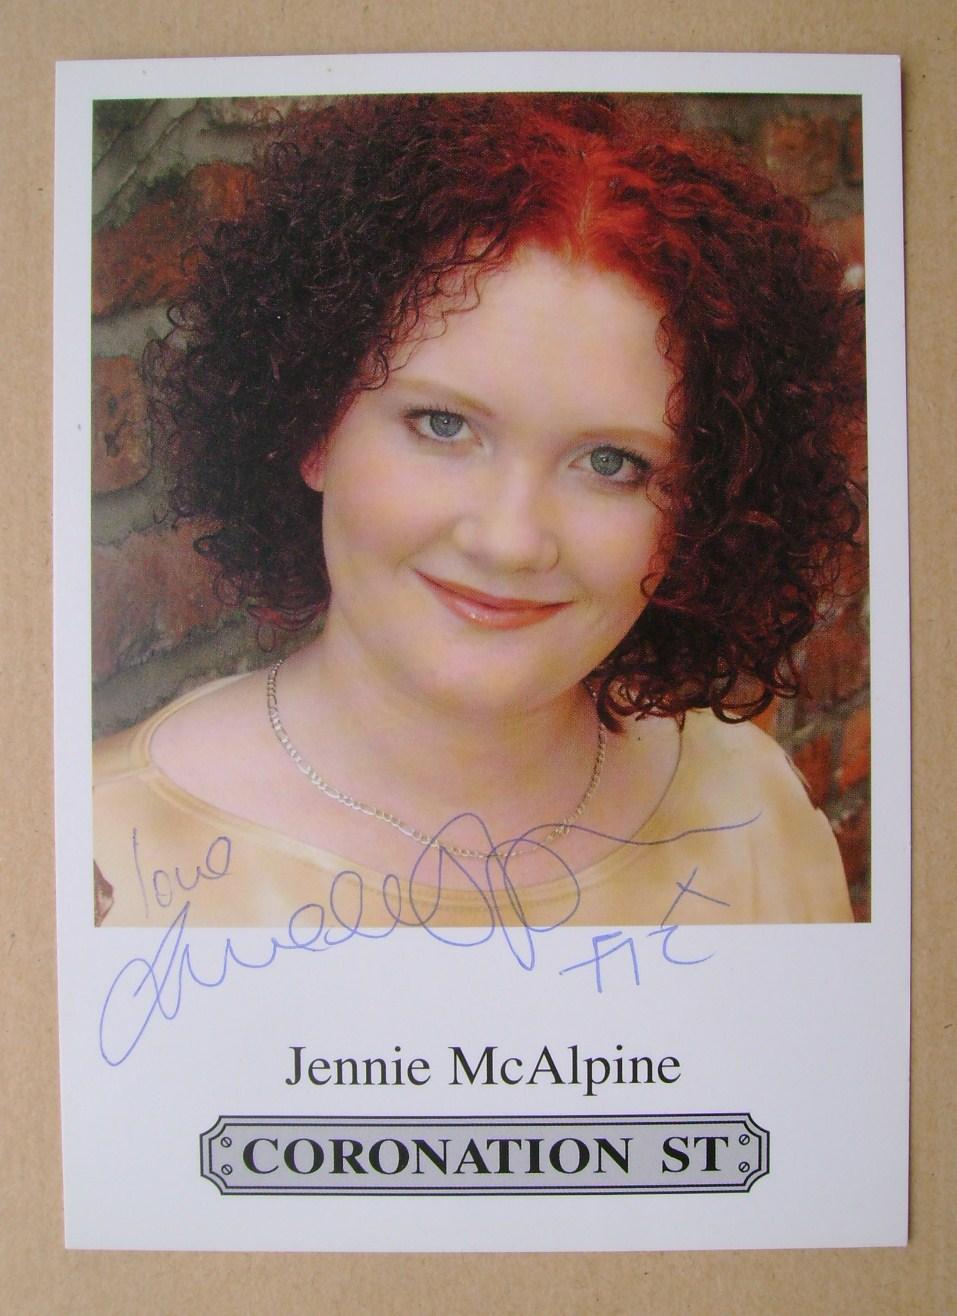 Jennie McAlpine autograph (Coronation Street actor)